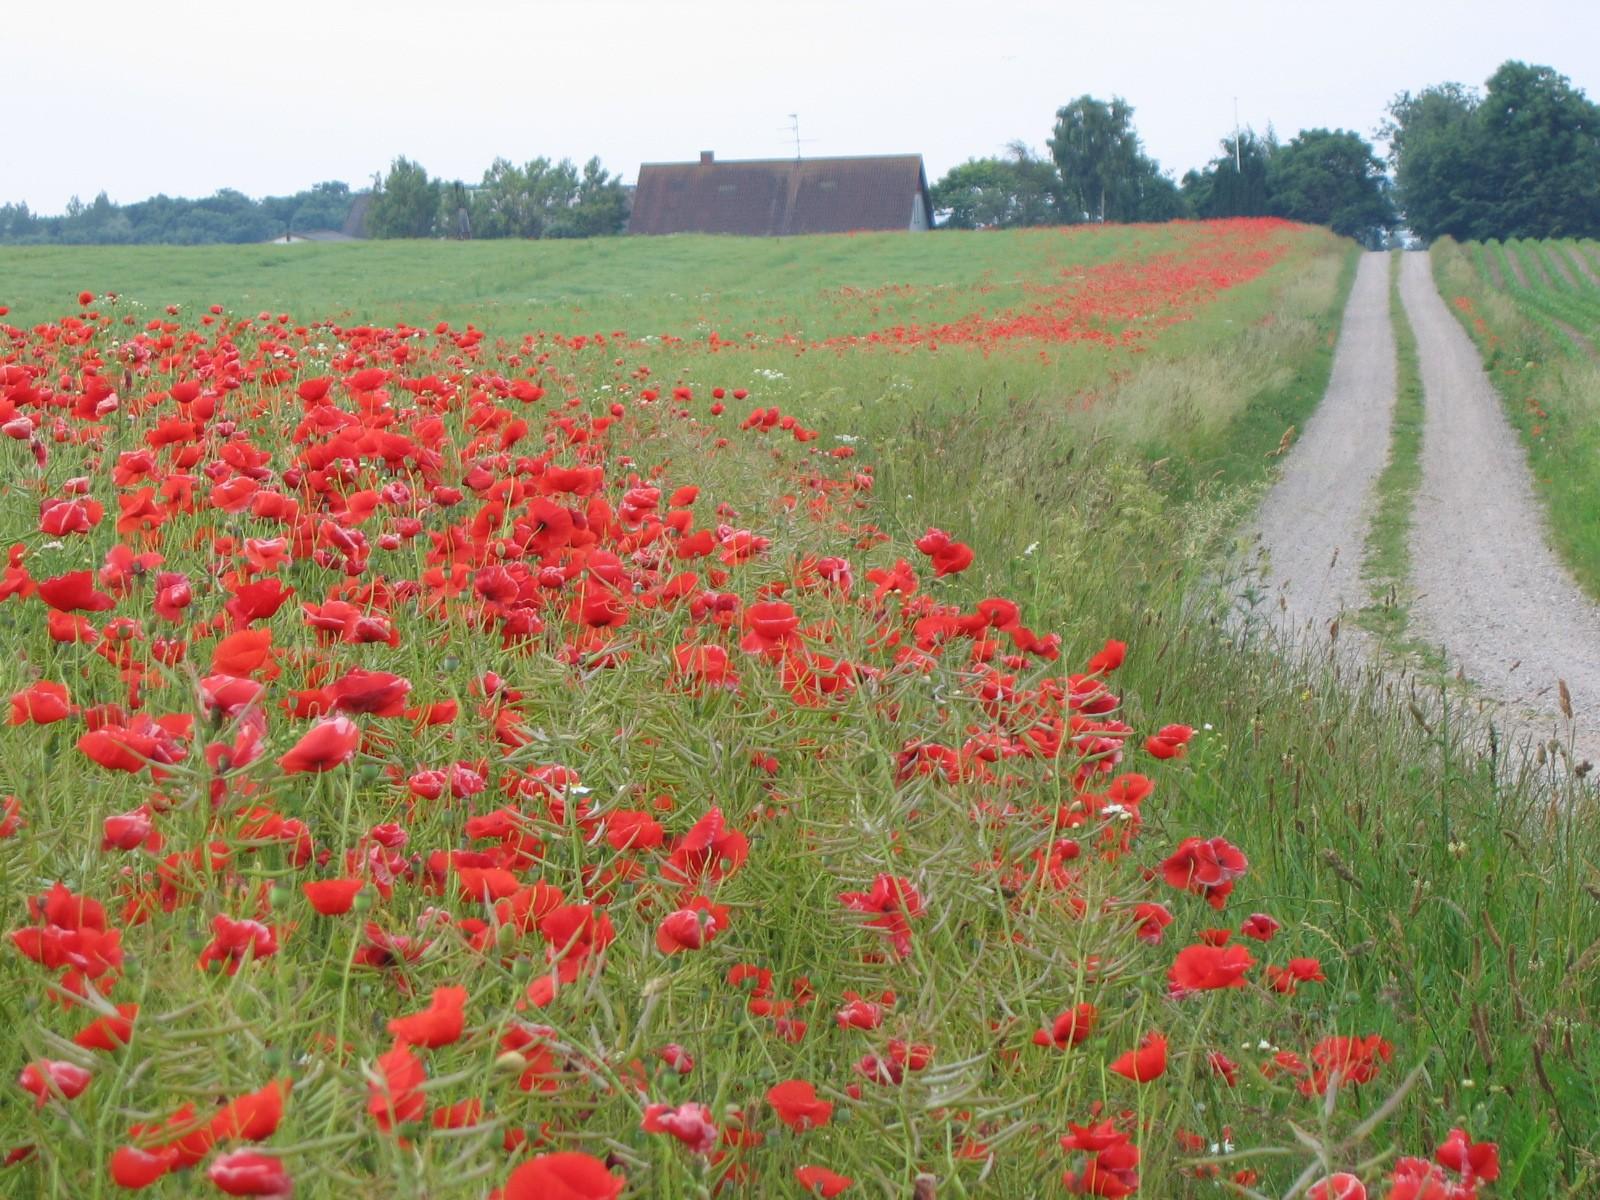 Wallpaper : flowers, field, dirt road, path, poppies, steppe